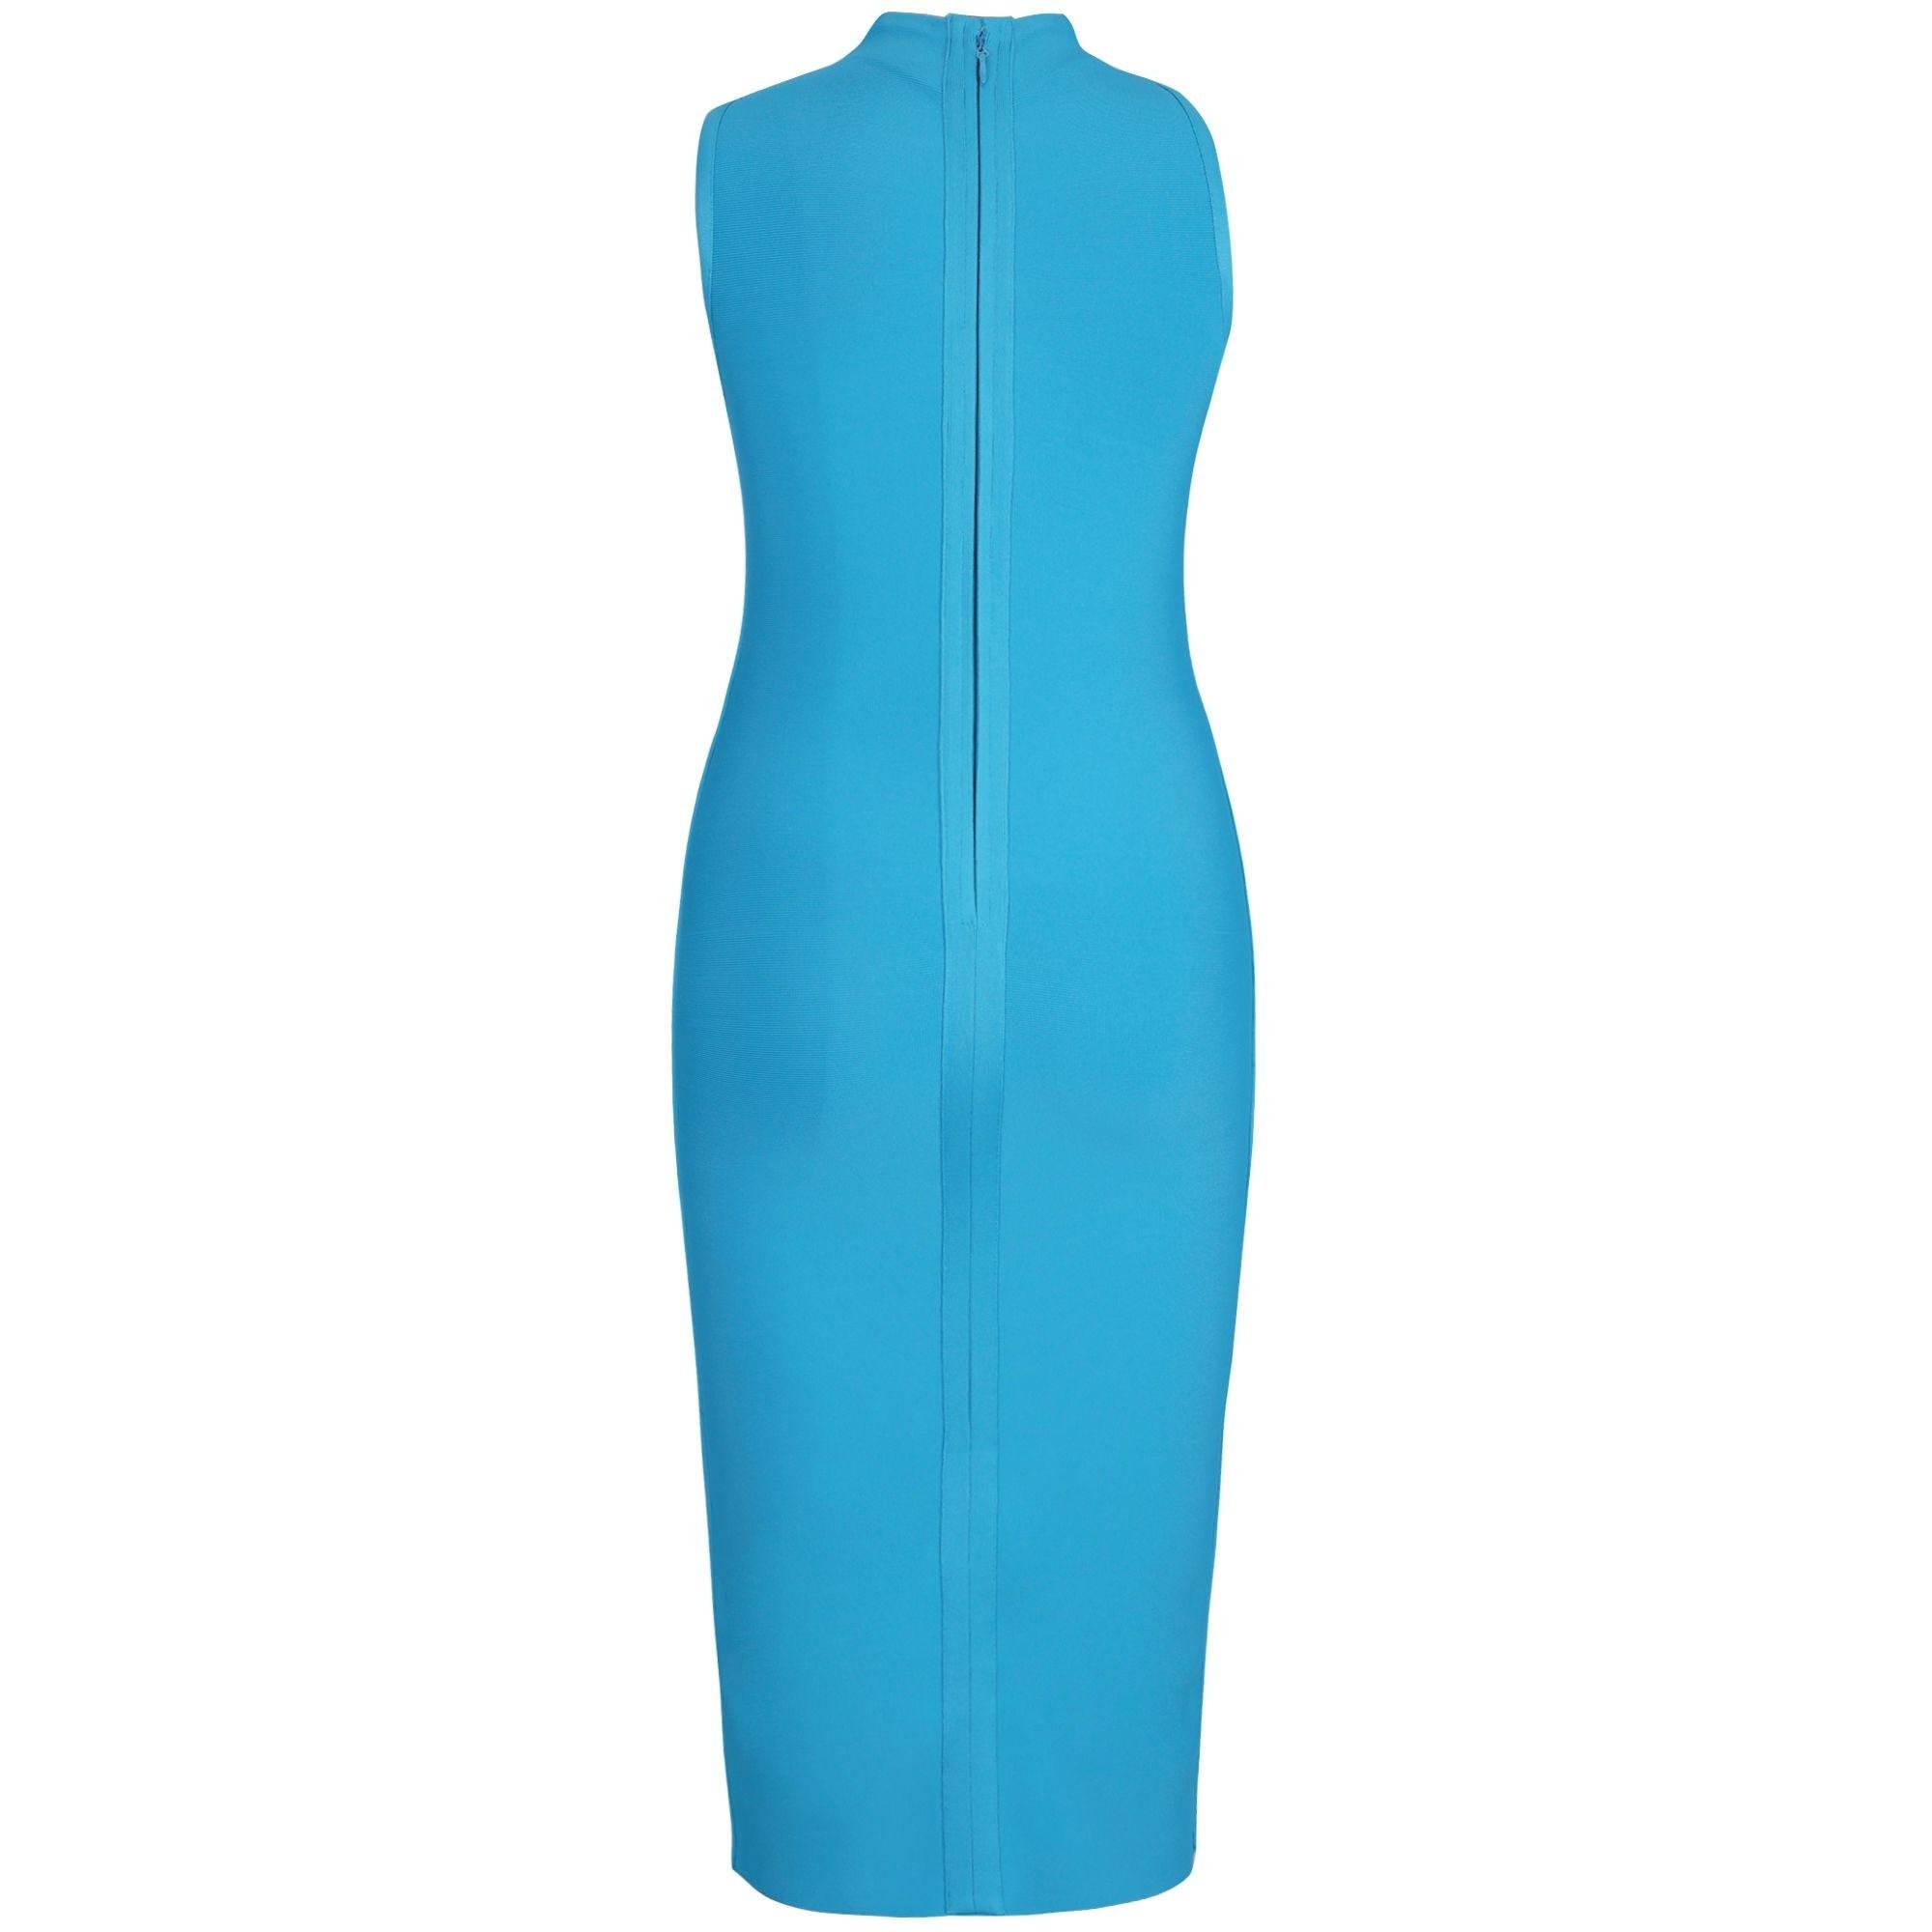 Blue Plus Size Plain Over Knee Sleeveless High Neck Bandage Dress DPHK053-Blue